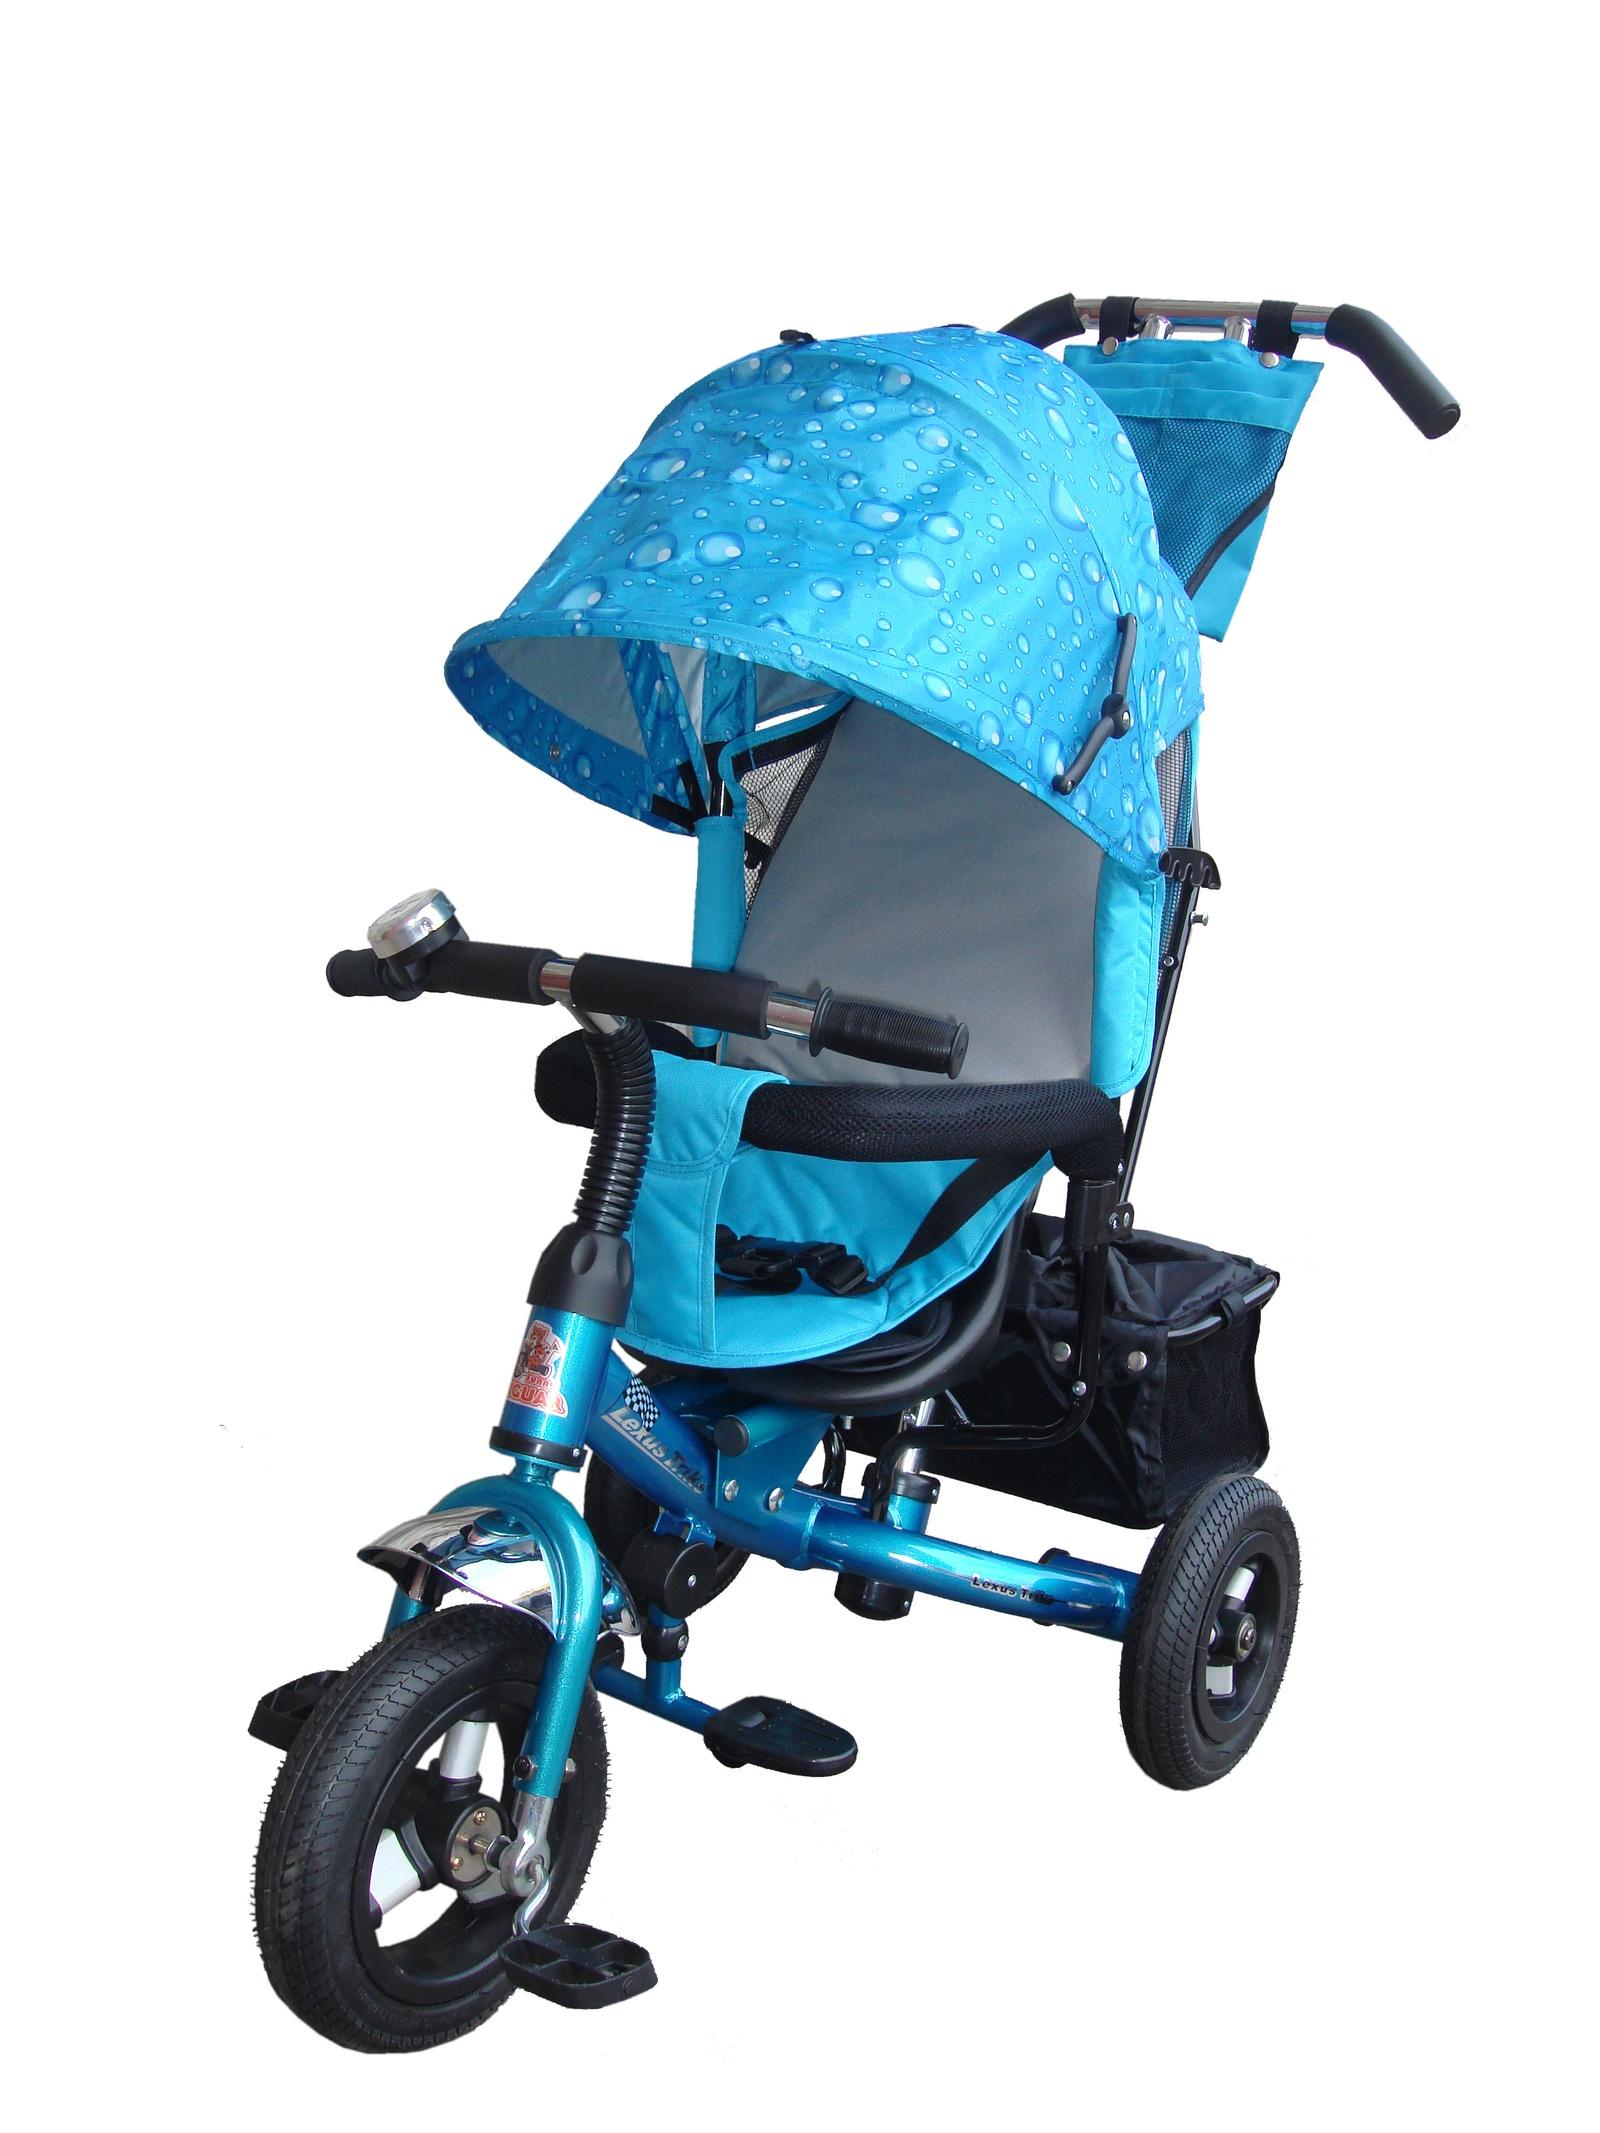 Велосипед Lexus Trike MS-0526, голубой велосипед для ребенка 3 года